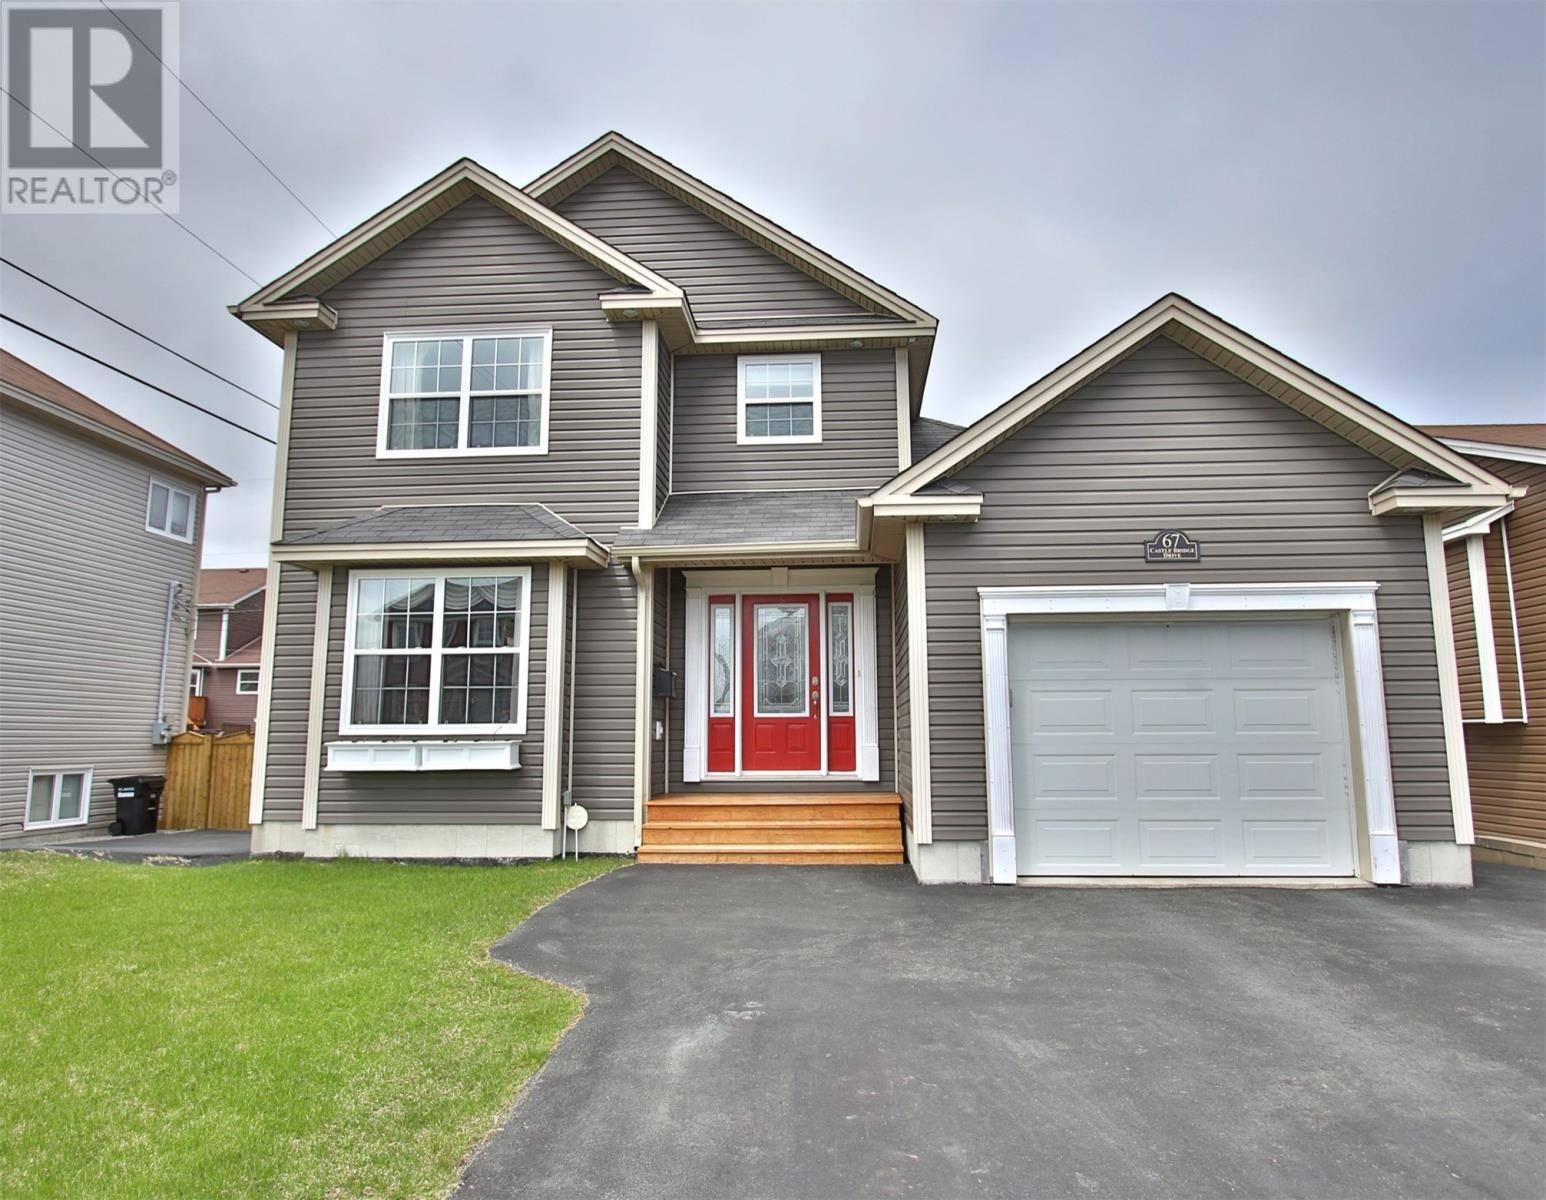 House for sale at 67 Castle Bridge Dr St. John's Newfoundland - MLS: 1209323